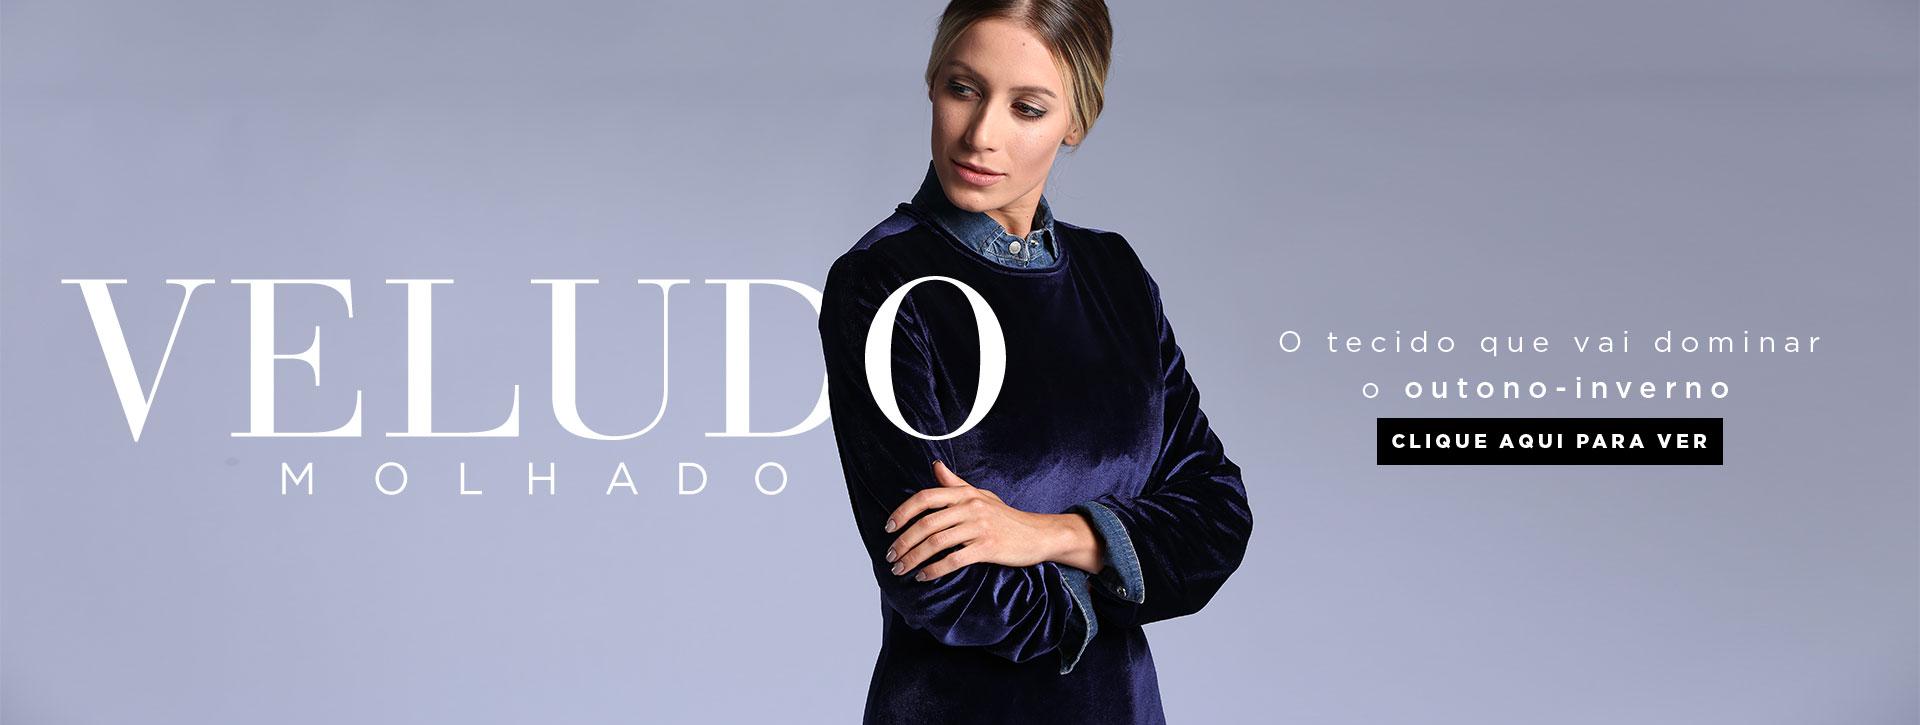 Banner Veludo